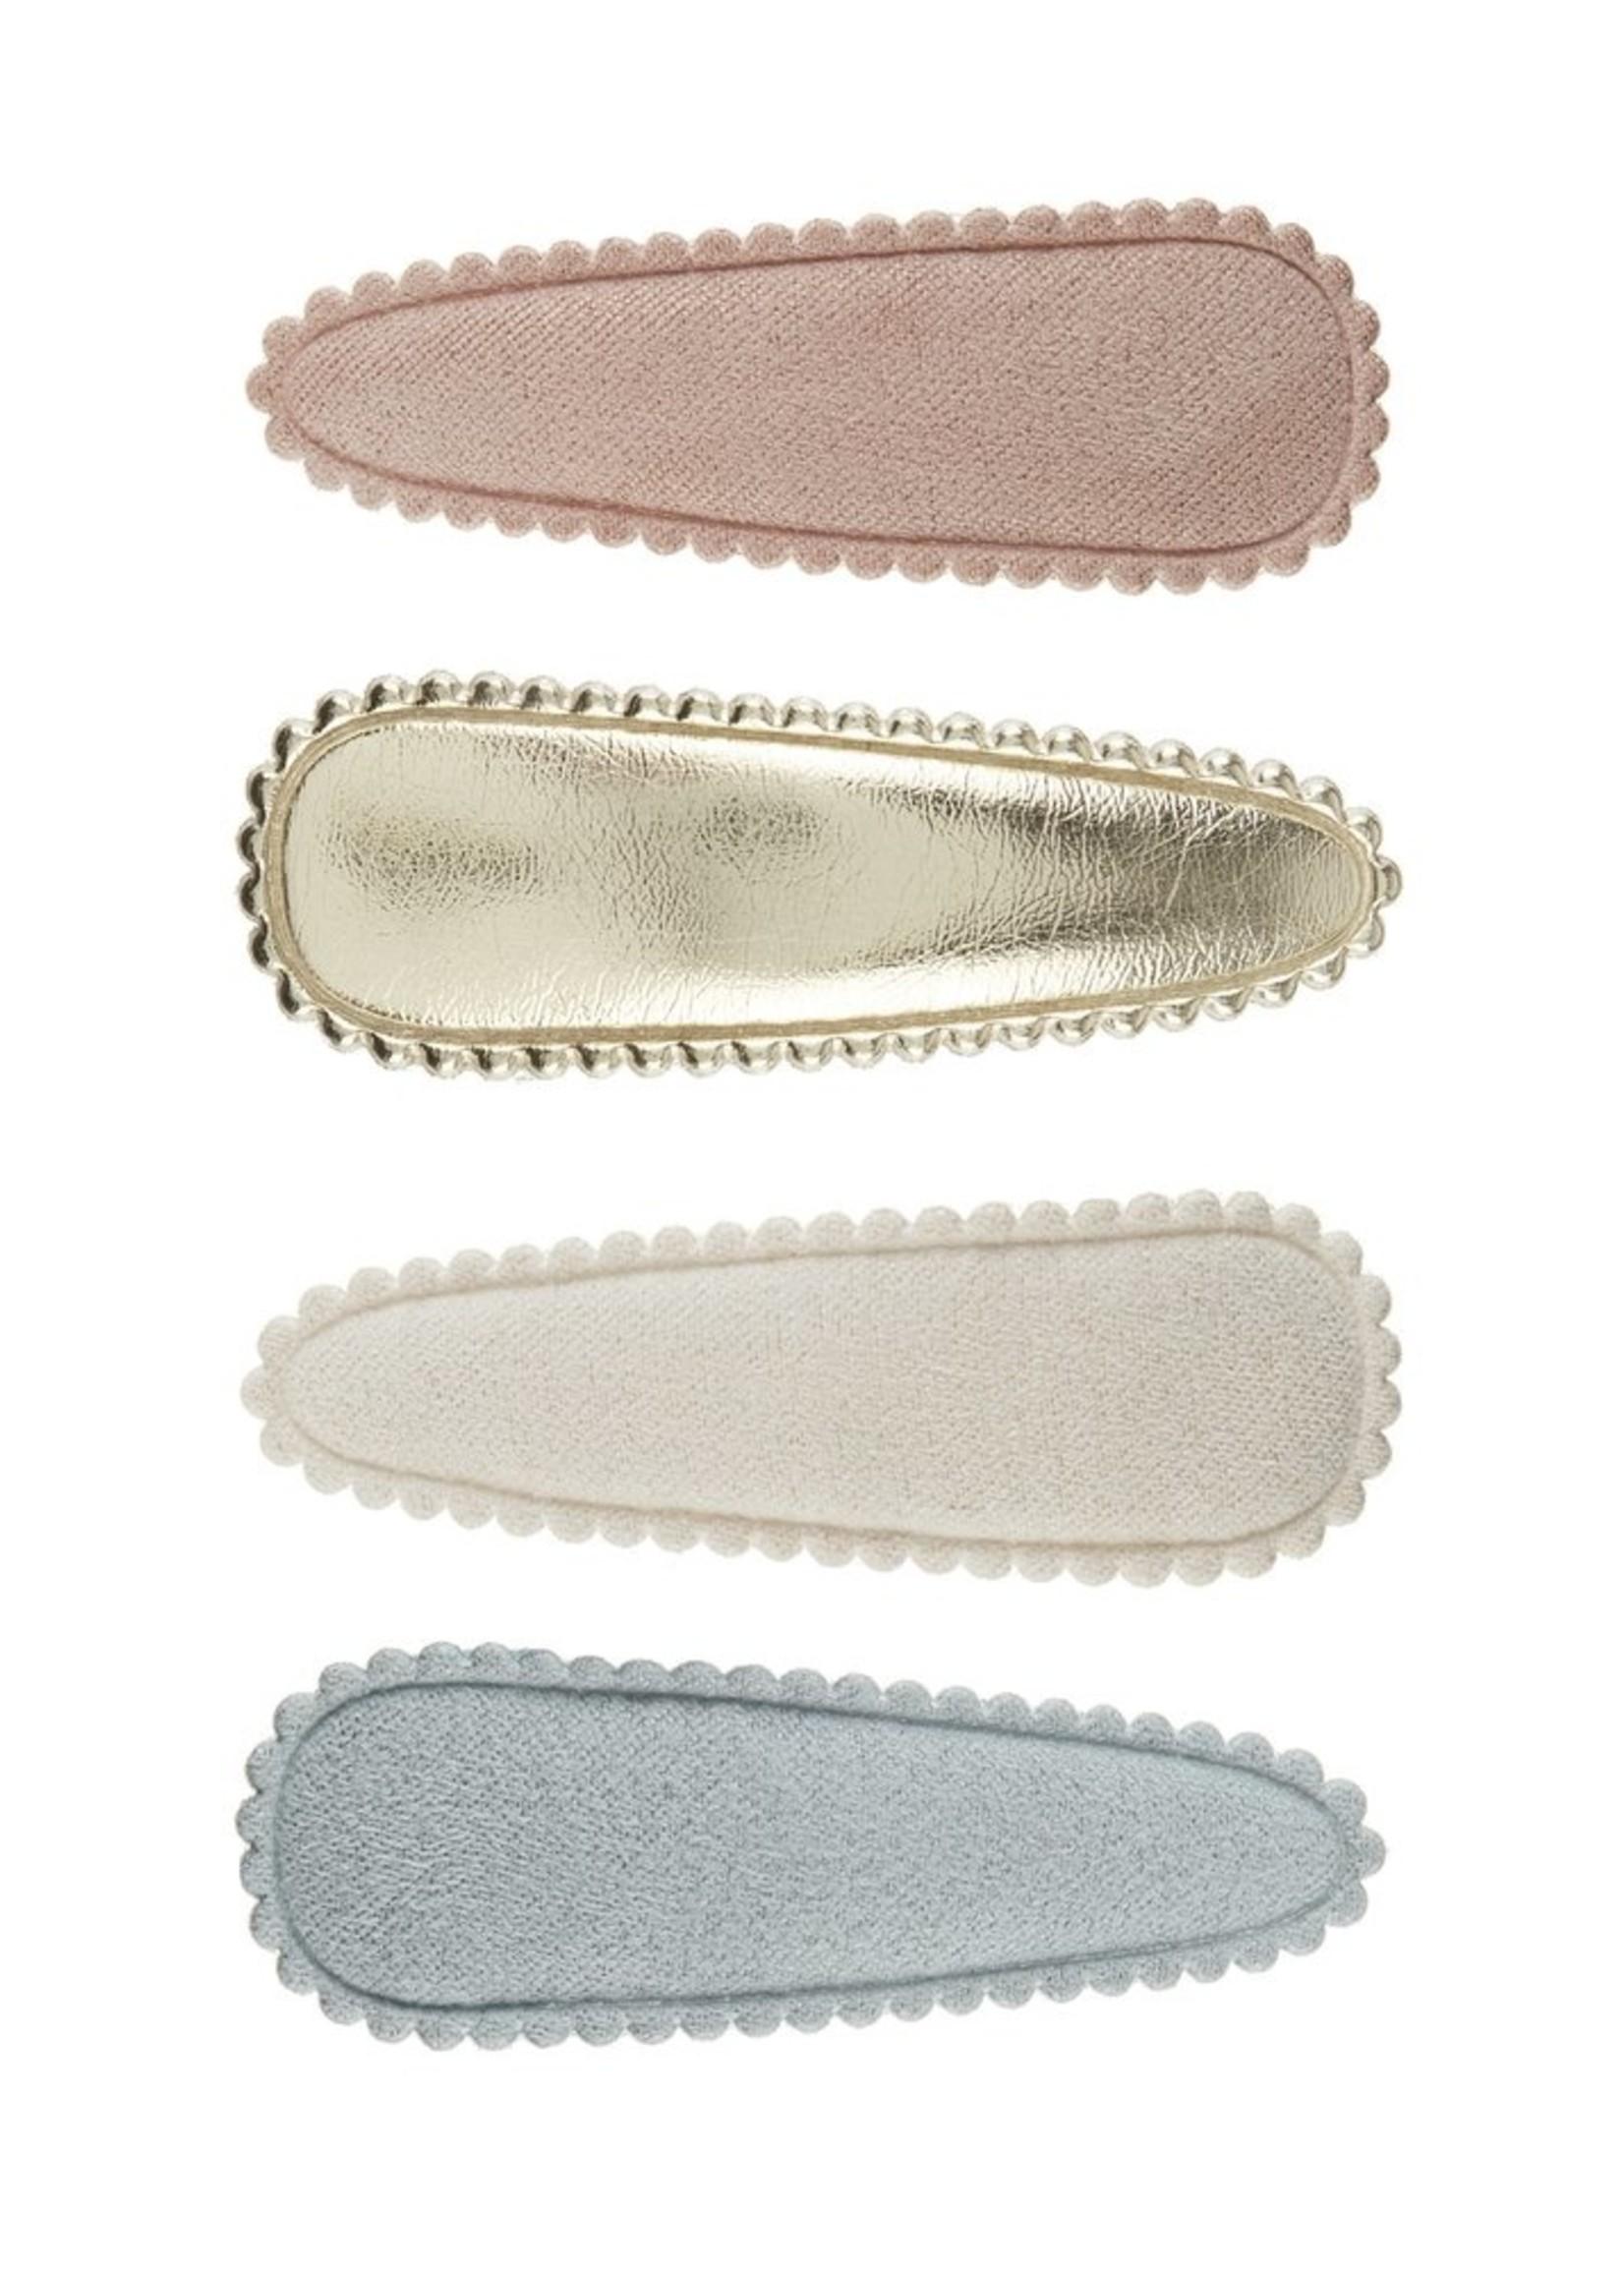 Mimi and Lula M&L - Pastel Blush Sparkle Clic Clacs